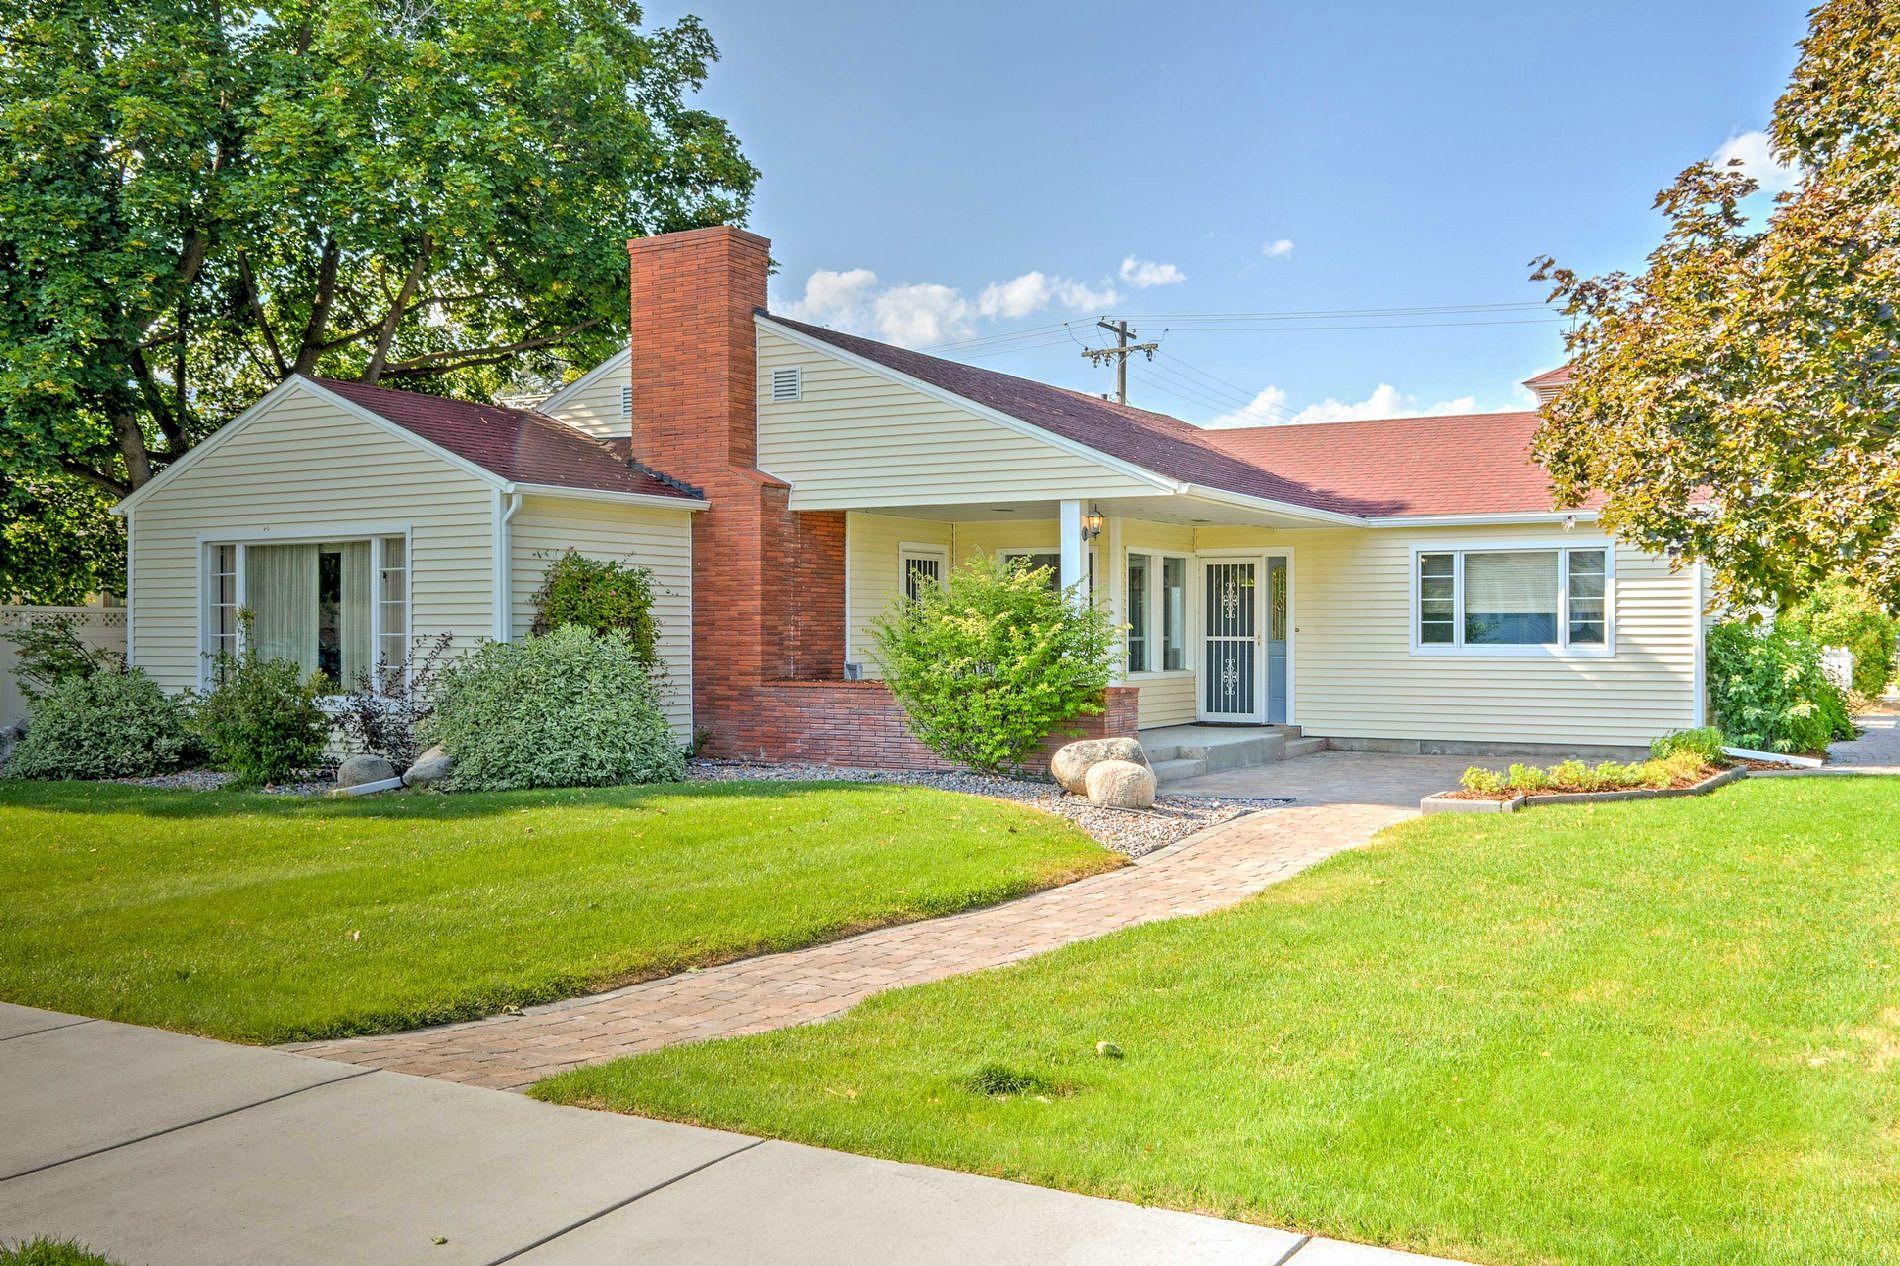 Houses for Rent in Hamilton, MT - RentDigs.com